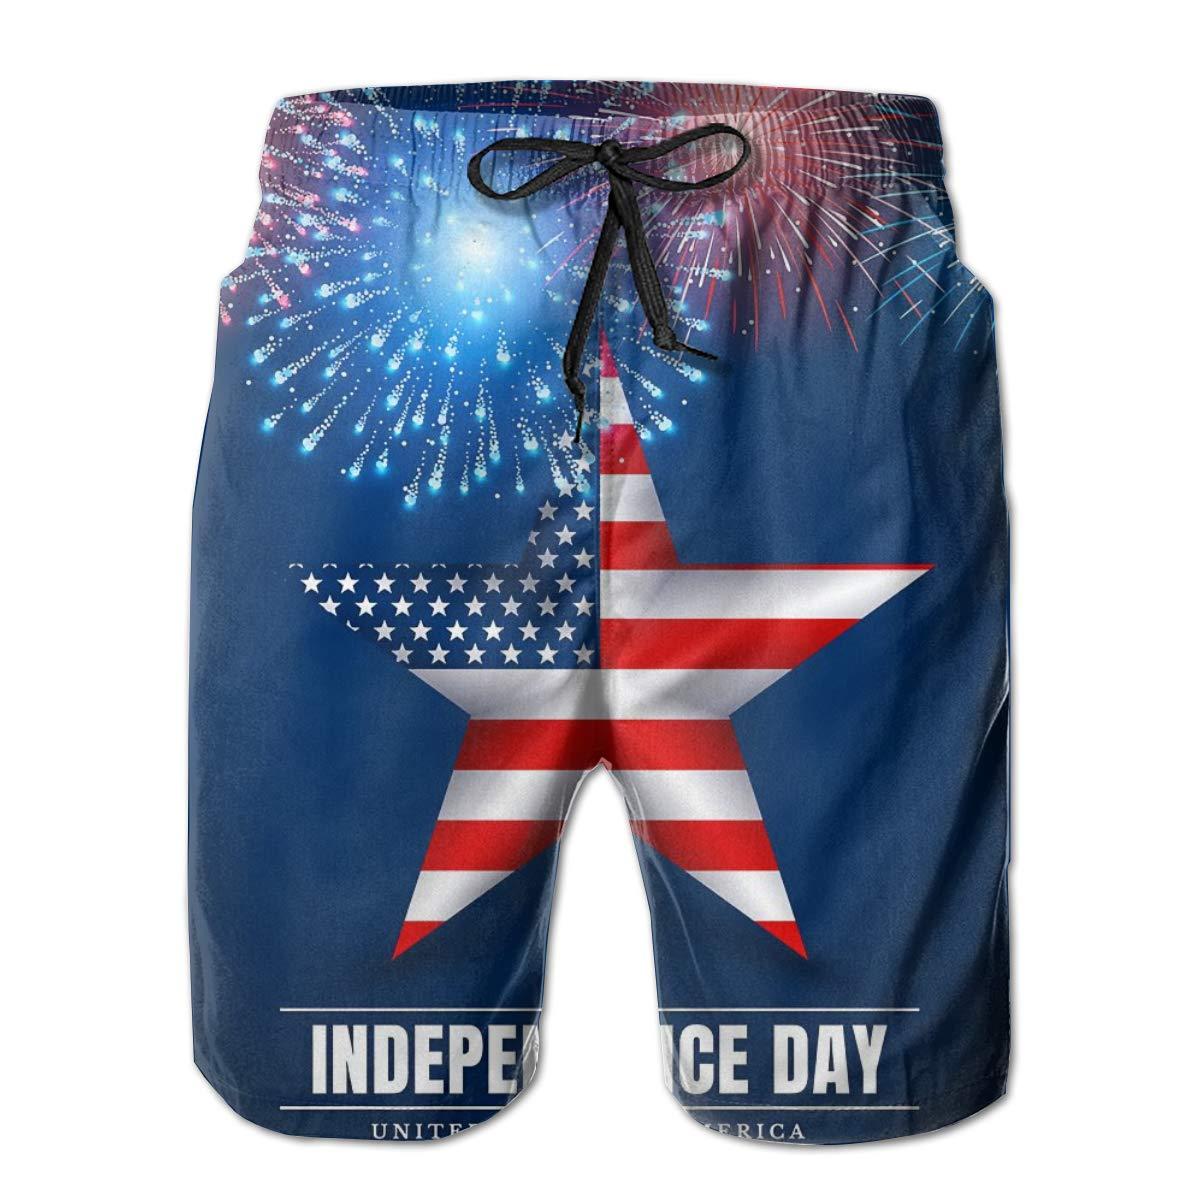 SARA NELL Mens Swim Trunks 4 Th July USA Star Independence Day Fireworks Surfing Beach Board Shorts Swimwear